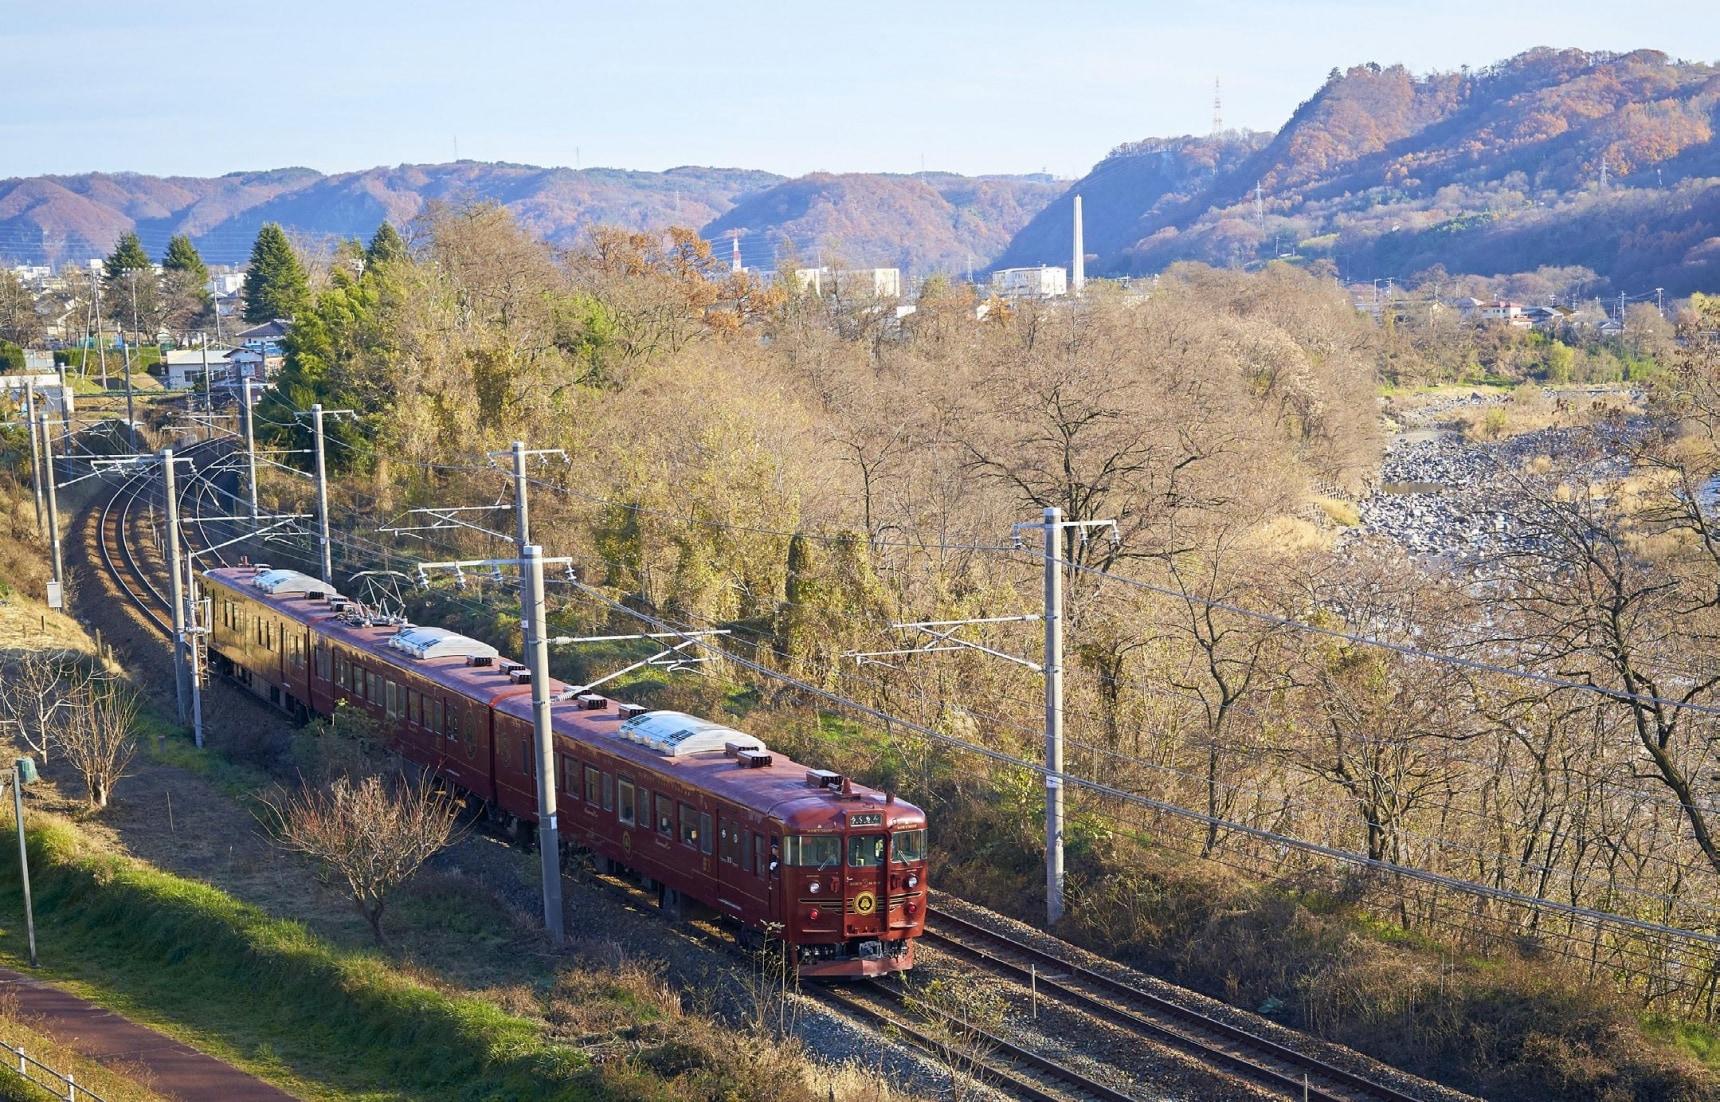 A Gourmet Train Journey to Sample Shinshu